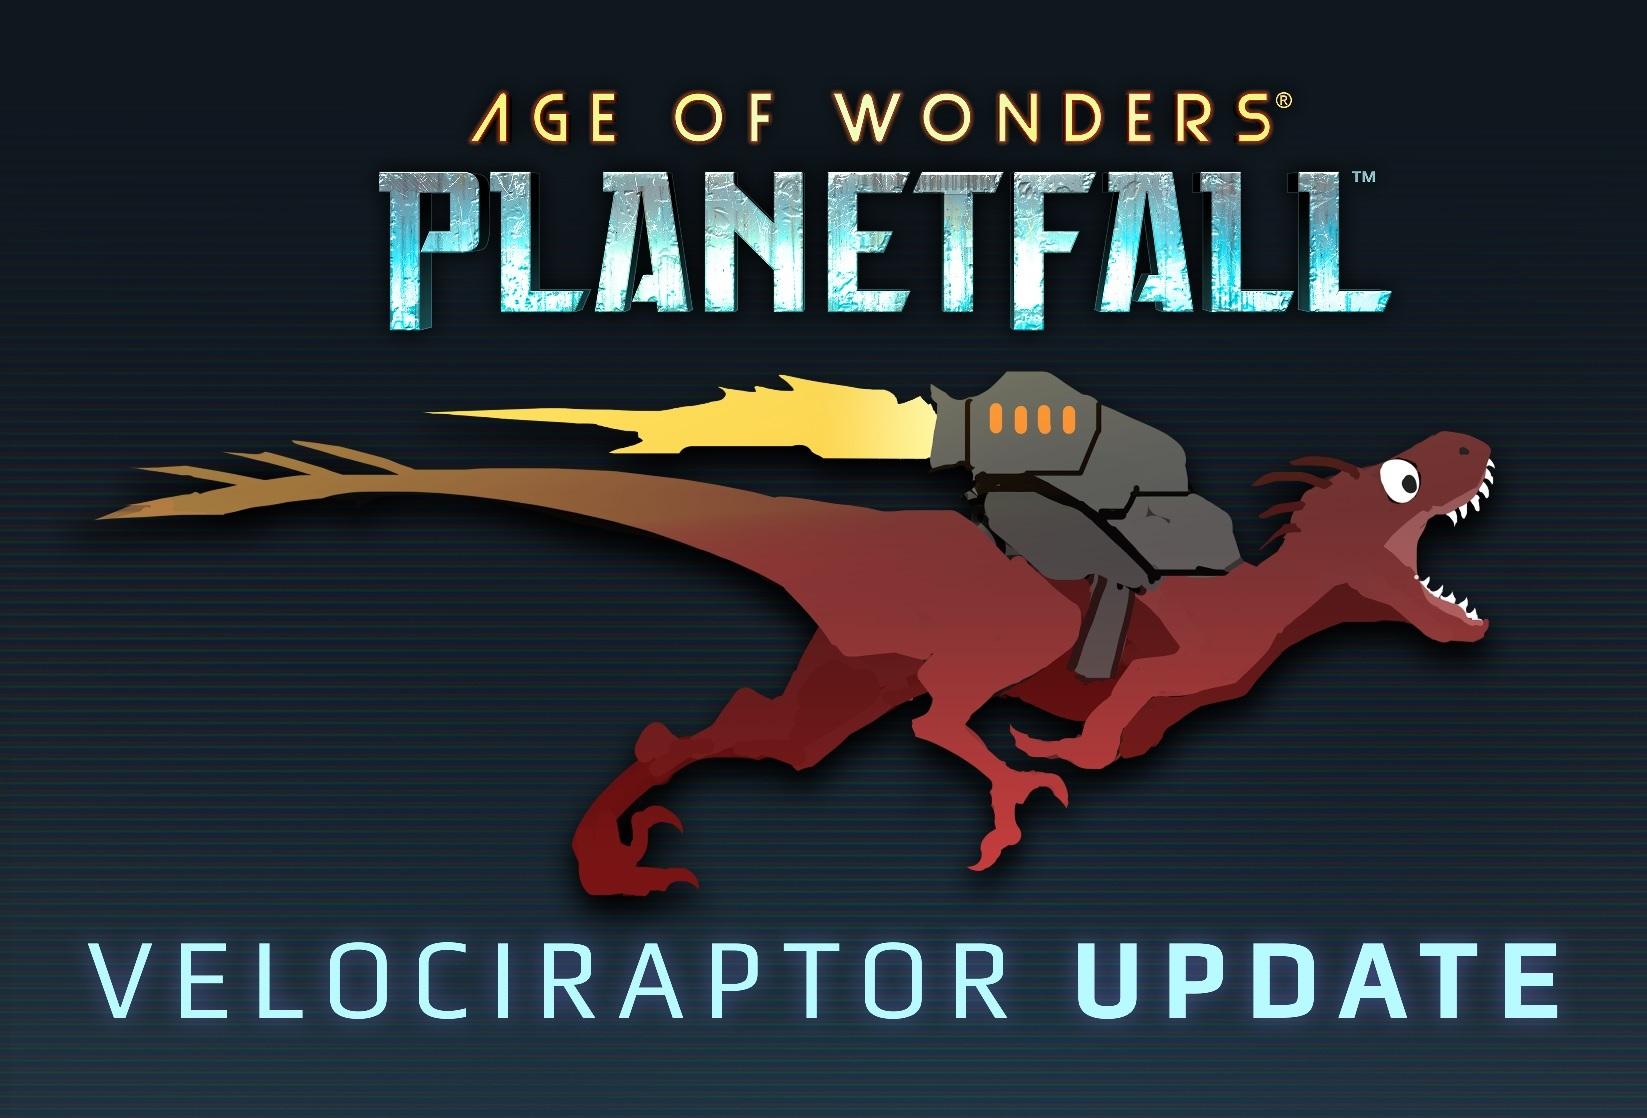 PF_Update_Velociraptor.jpg